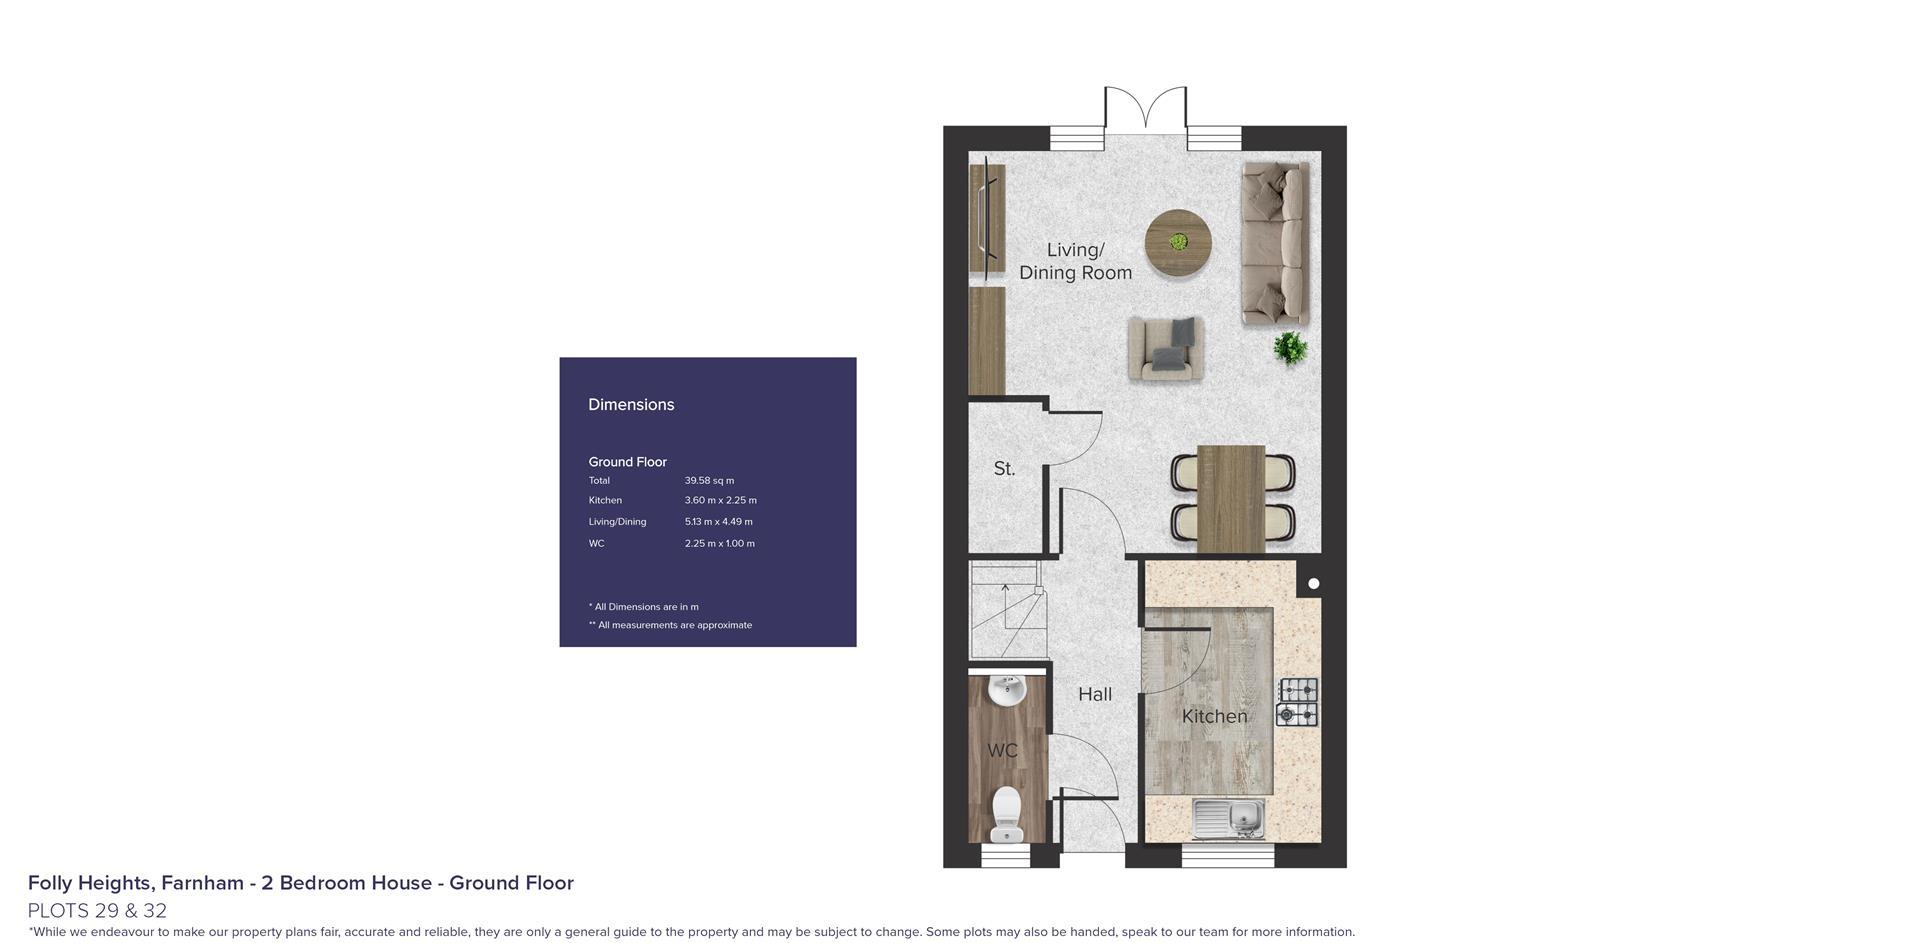 Folly Heights, Farnham_ Plots 29 & 32_GF_B.jpg